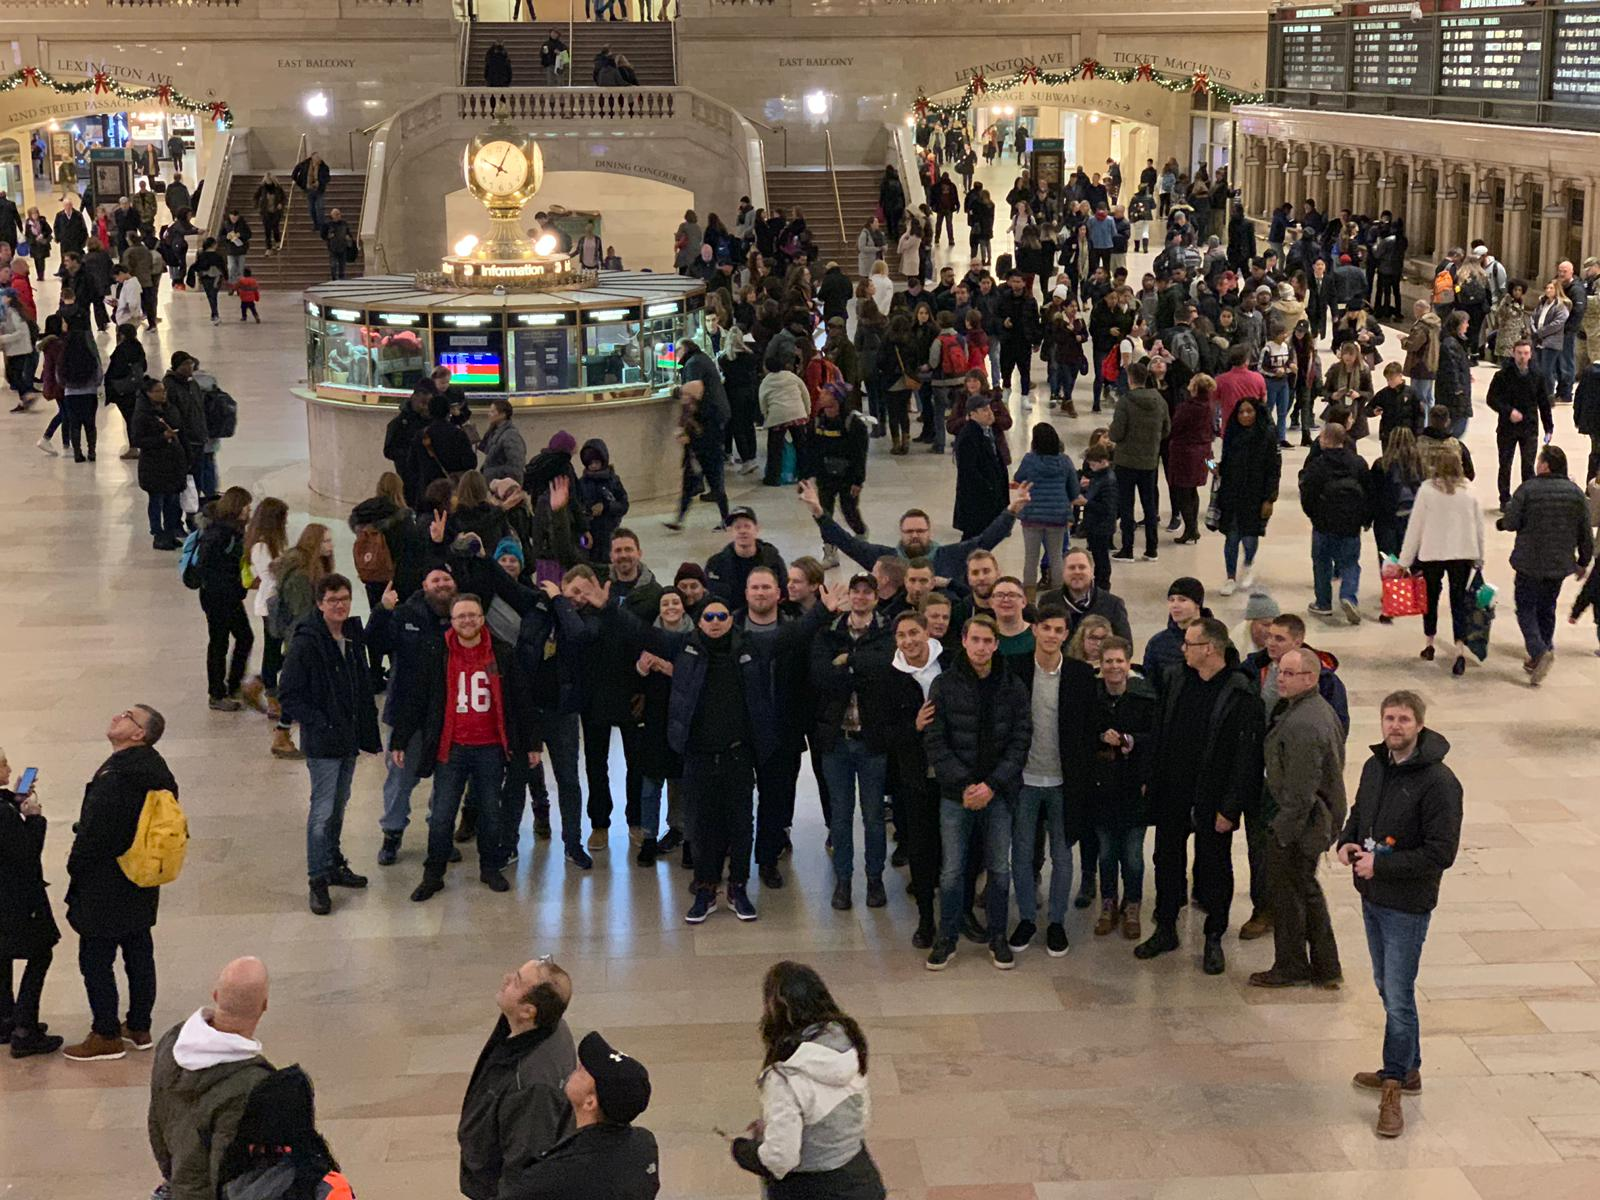 hela gruppen samlad på gran central station.jpg